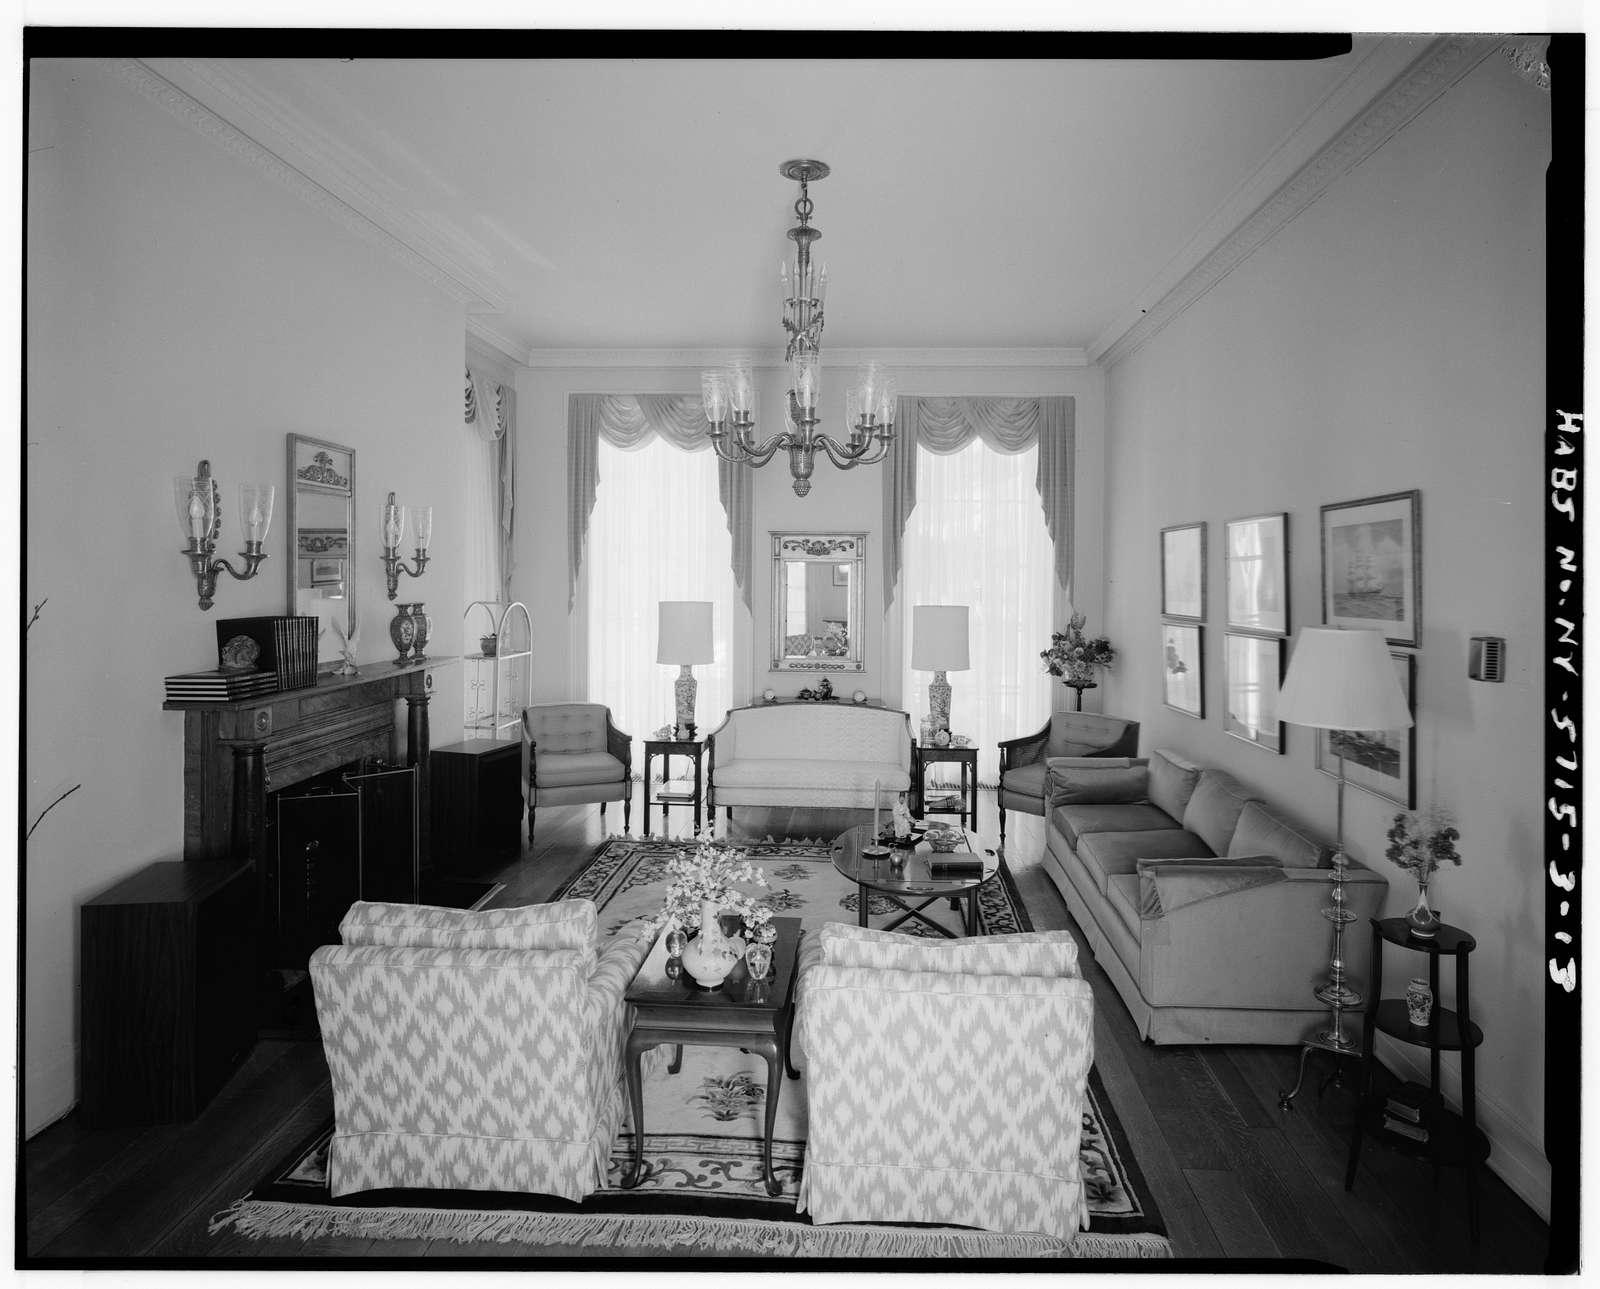 Governors Island, Commanding Officer's House, New York Harbor, Nolan Park near Barry Road, New York, New York County, NY